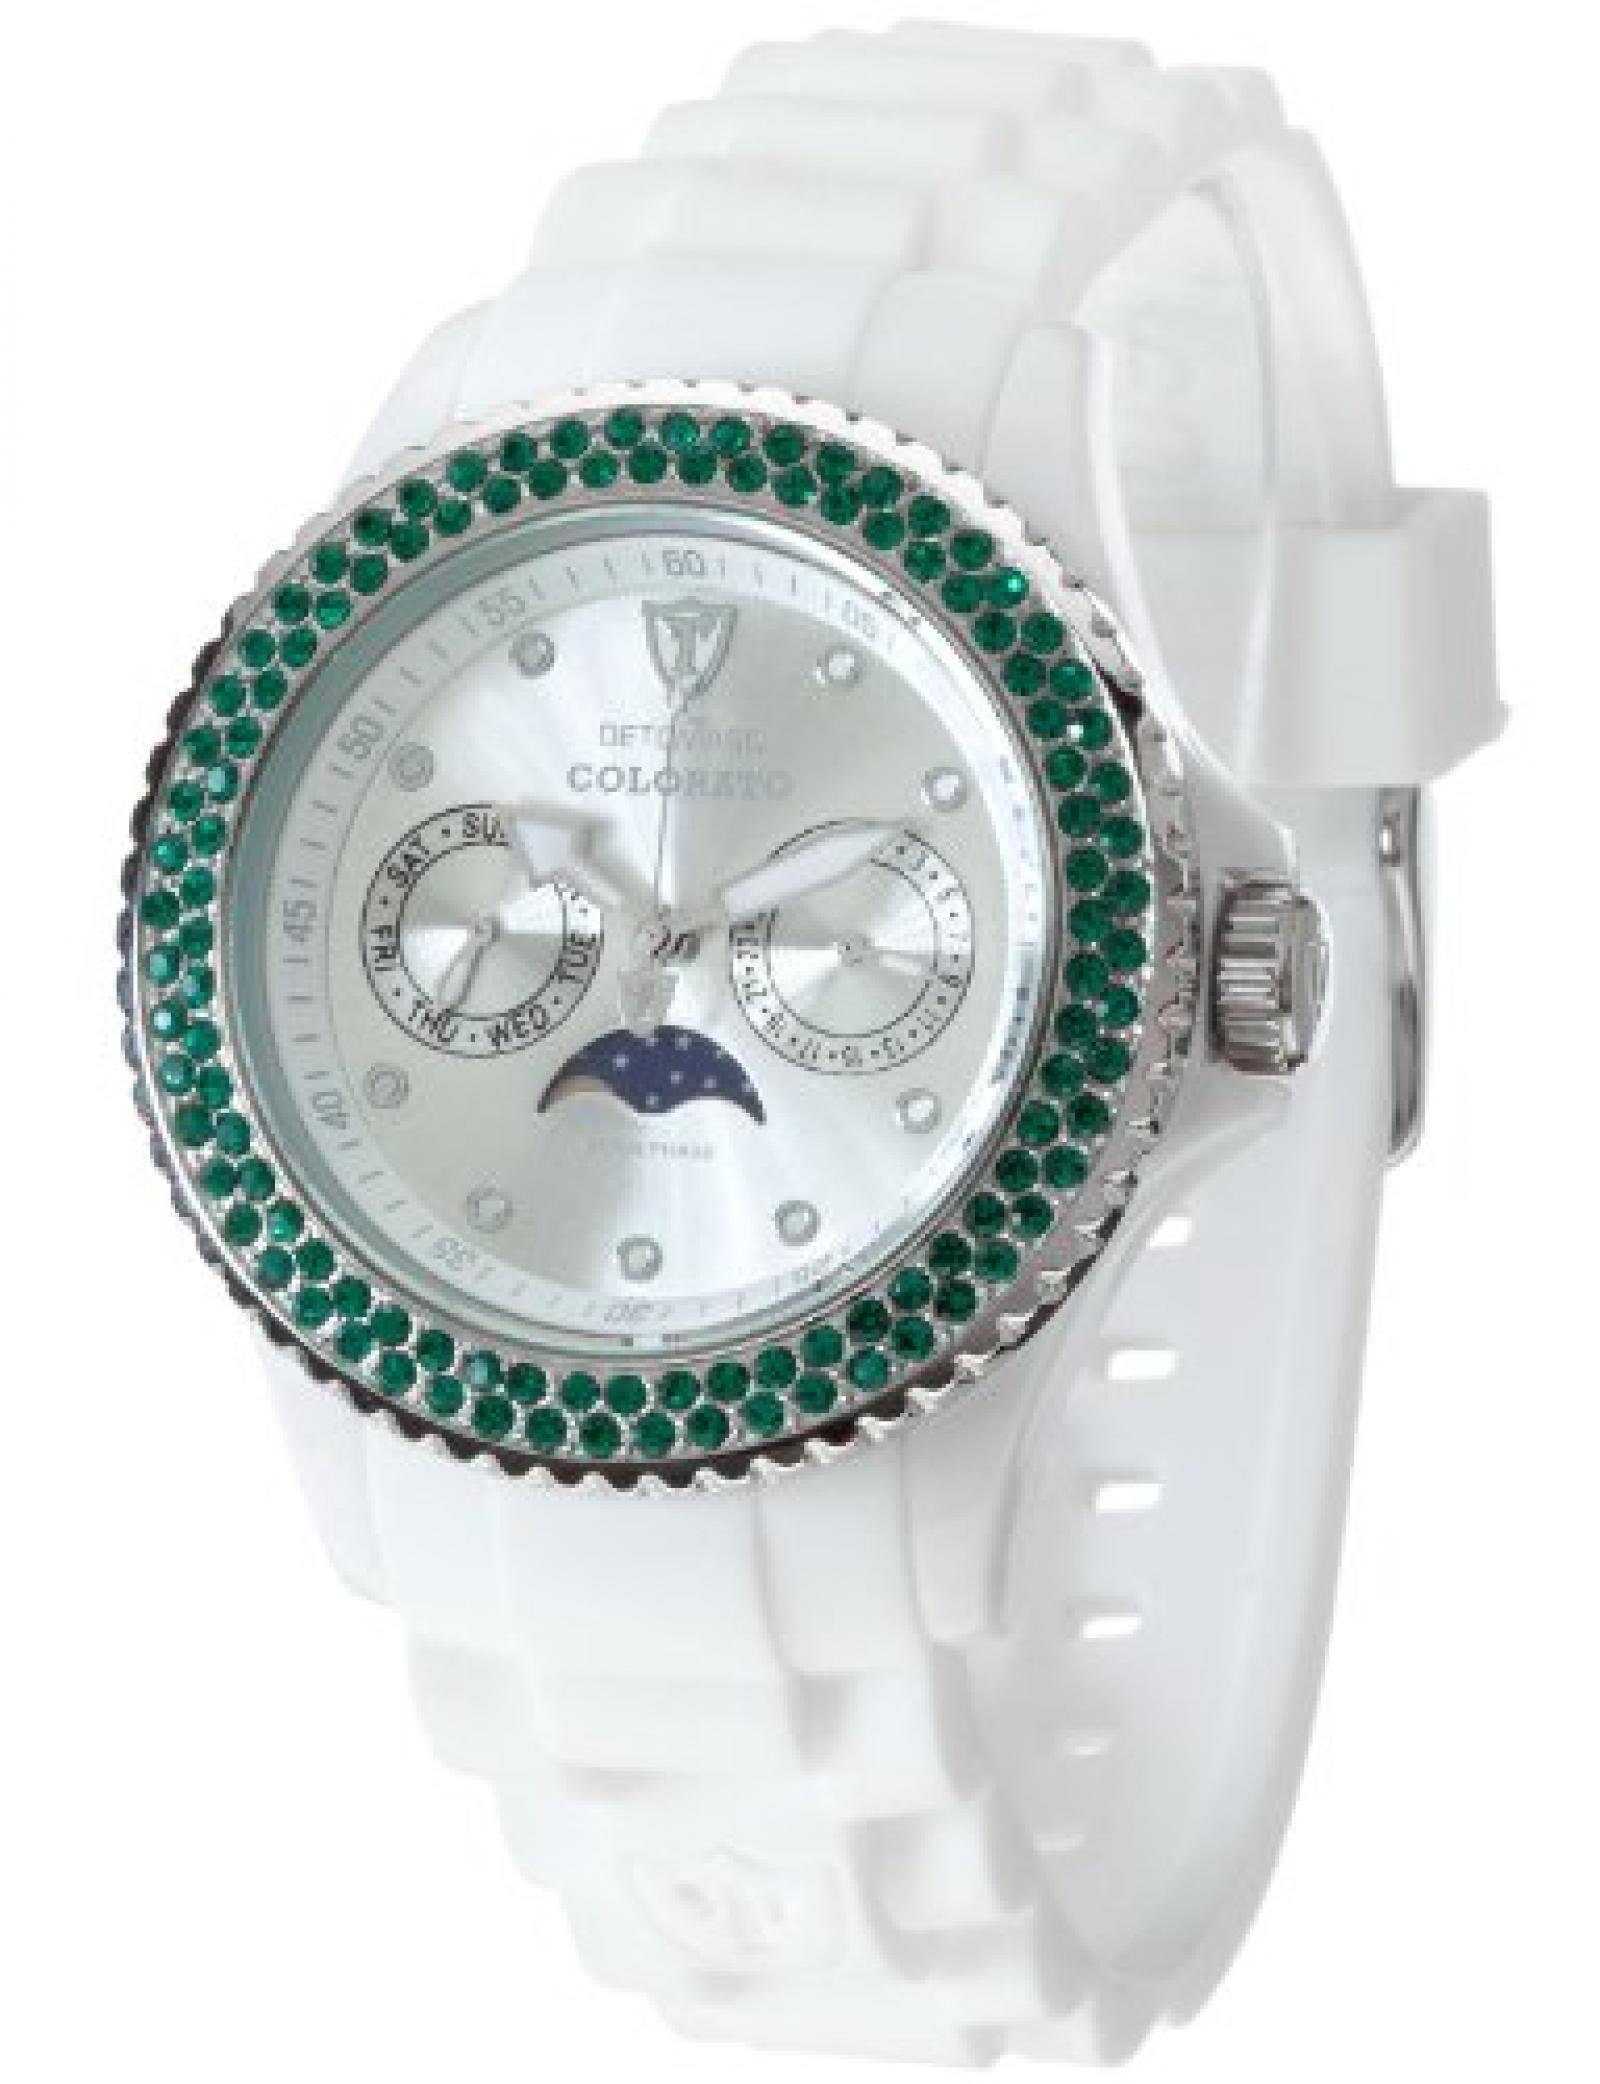 Detomaso Damen-Armbanduhr  COLORATO LUNA DT3017-C Ladies Analog Quarz Silikon DT3017-C